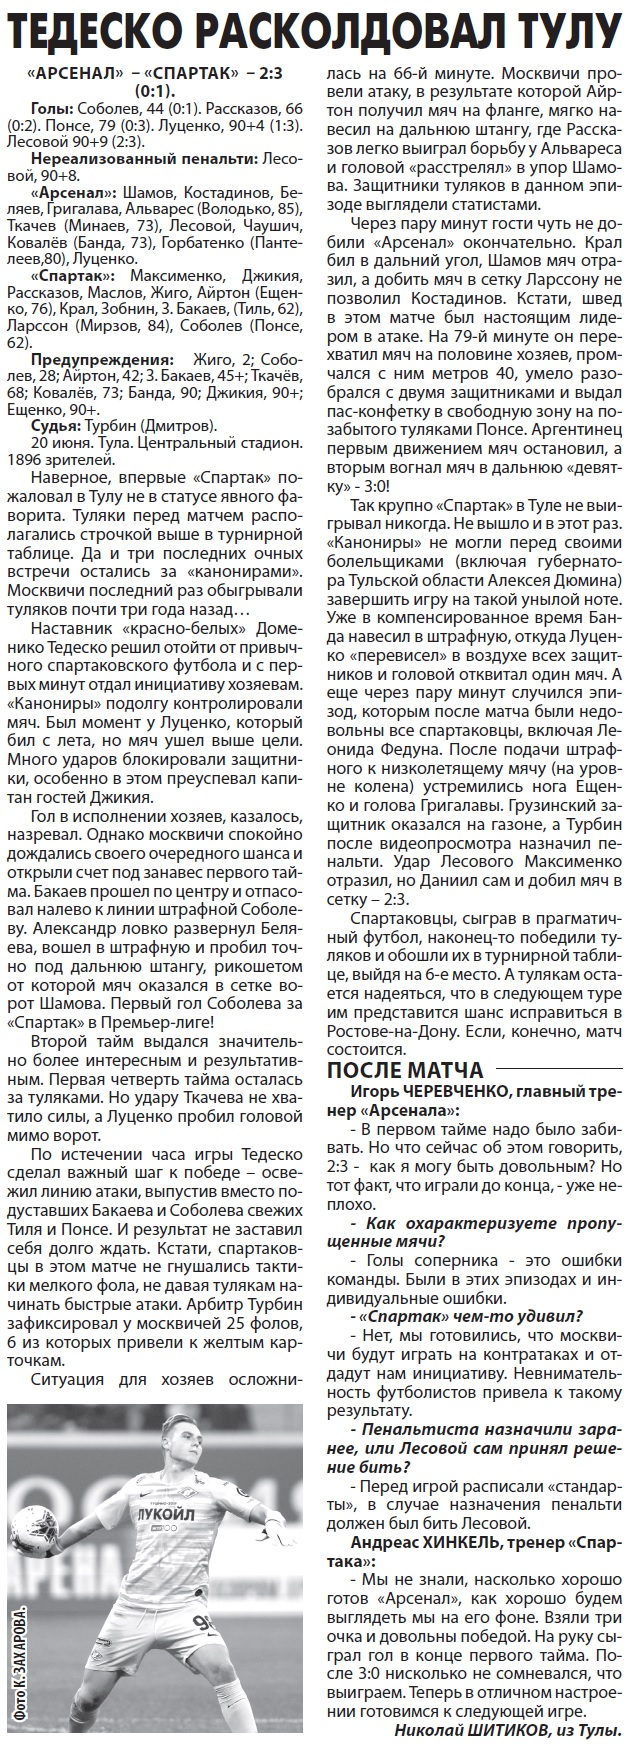 Арсенал (Тула) - Спартак (Москва) 2:3